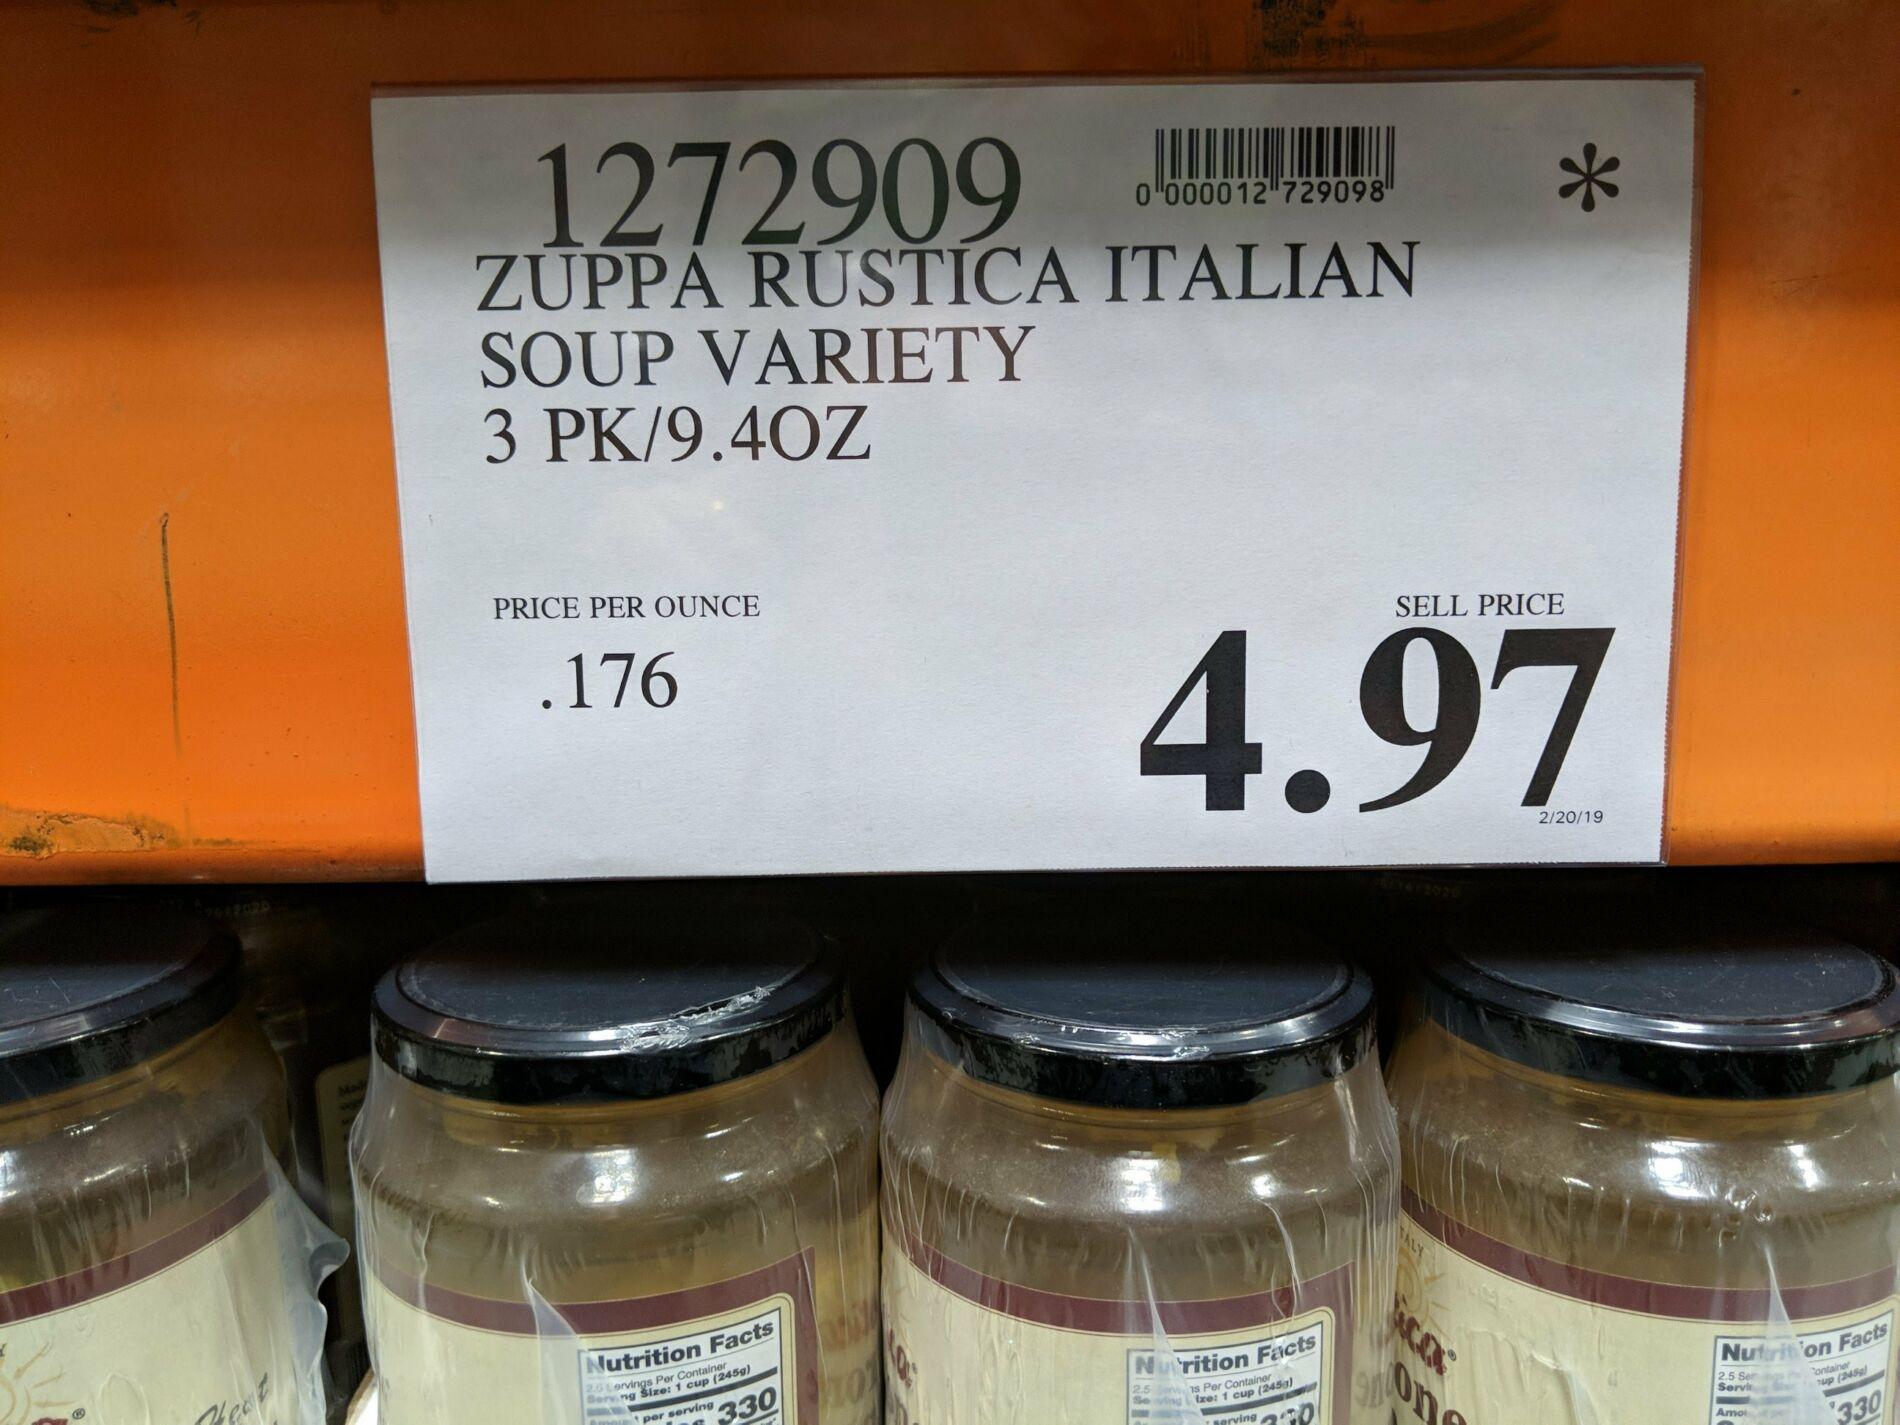 Zuppa Rustica Italian Soup Variety 3 Pack - $4 97 #costco